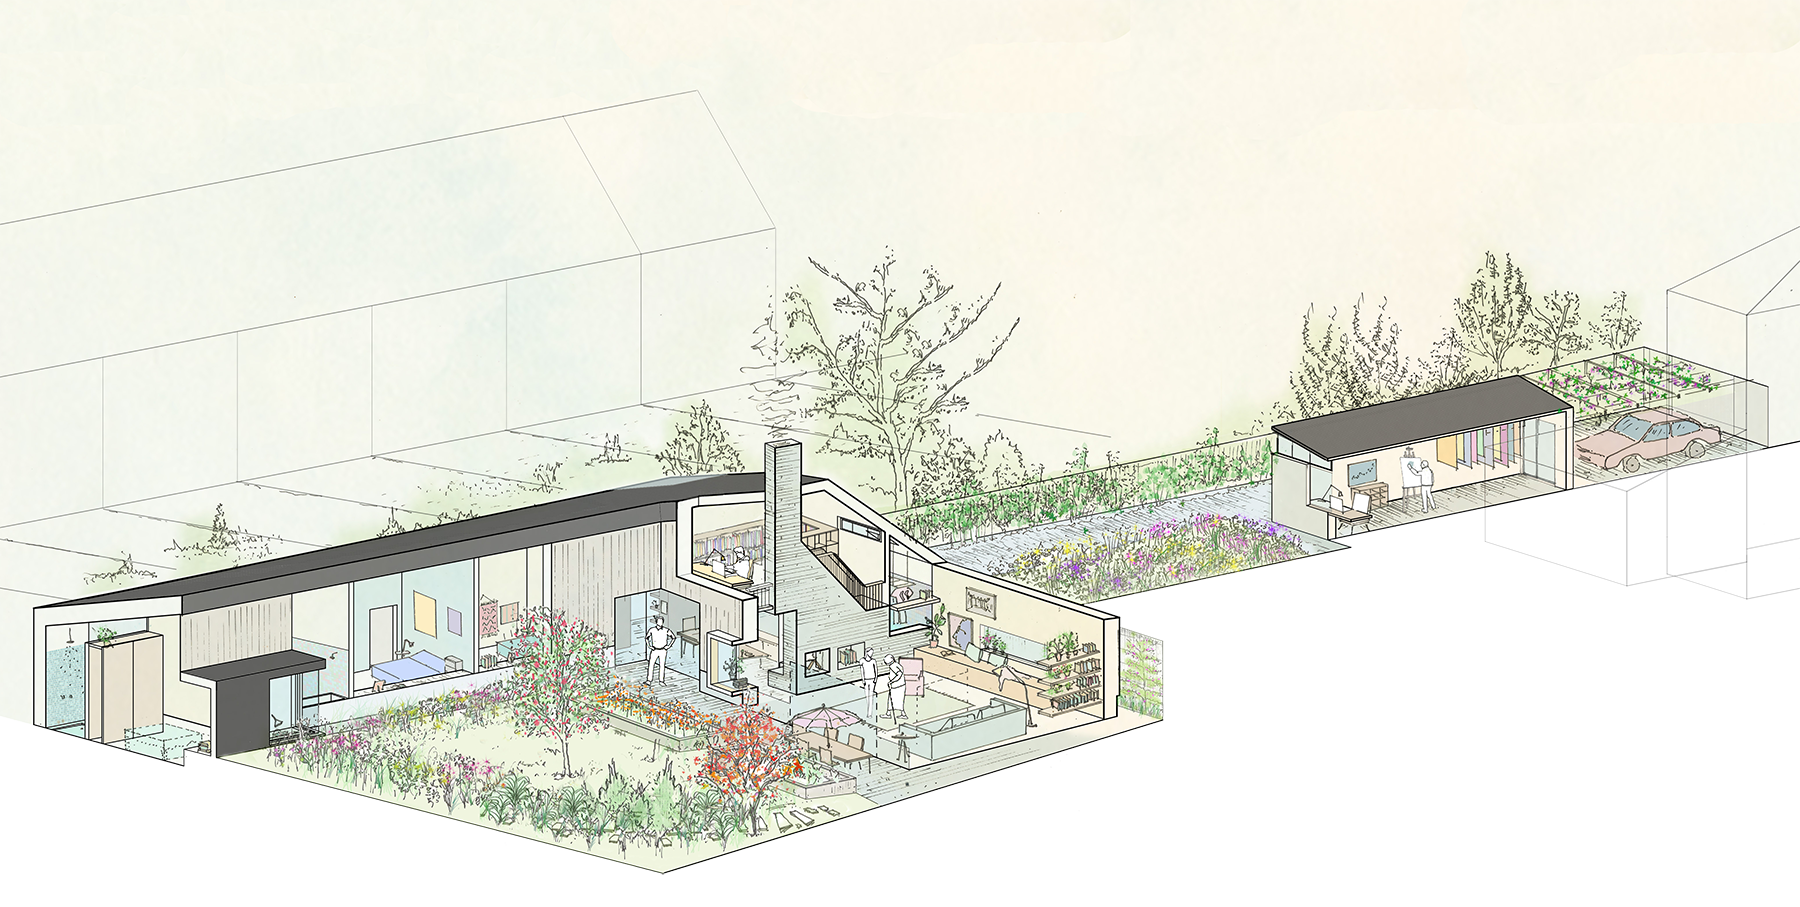 Sarah-Wigglesworth-Architects Haycroft-Gardens Overview-Year-15 1800